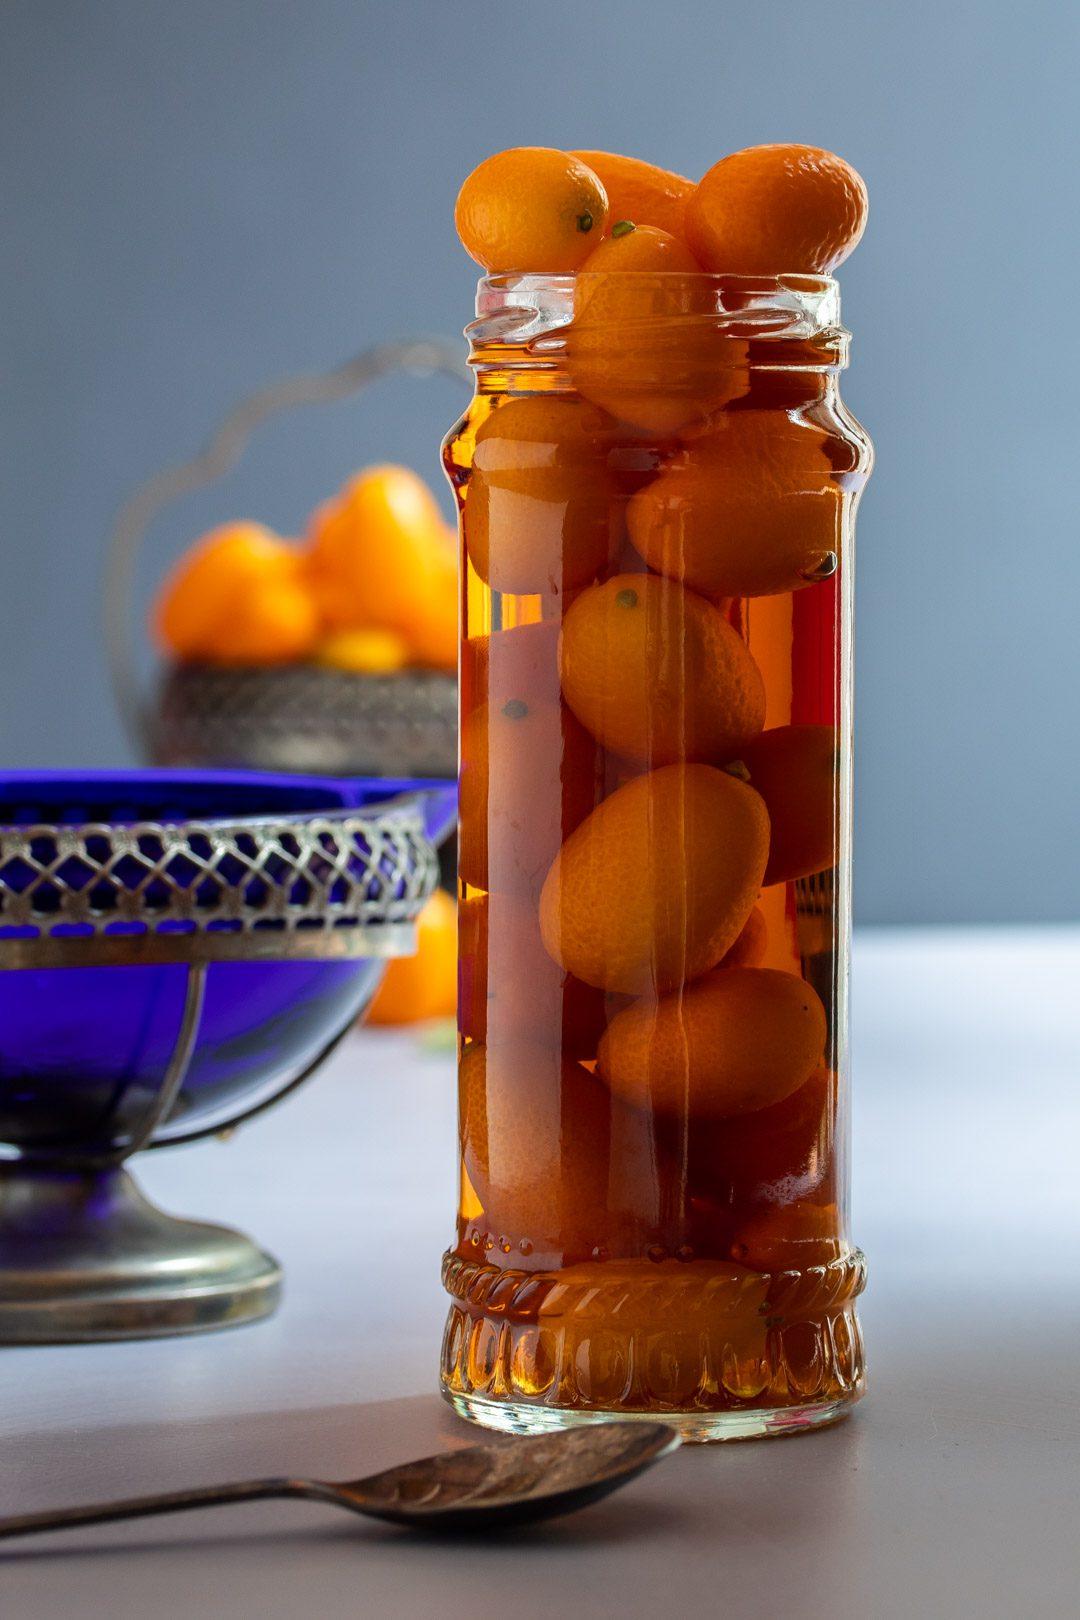 cumquat brandy with blue glass jug and dish of cumquats in background